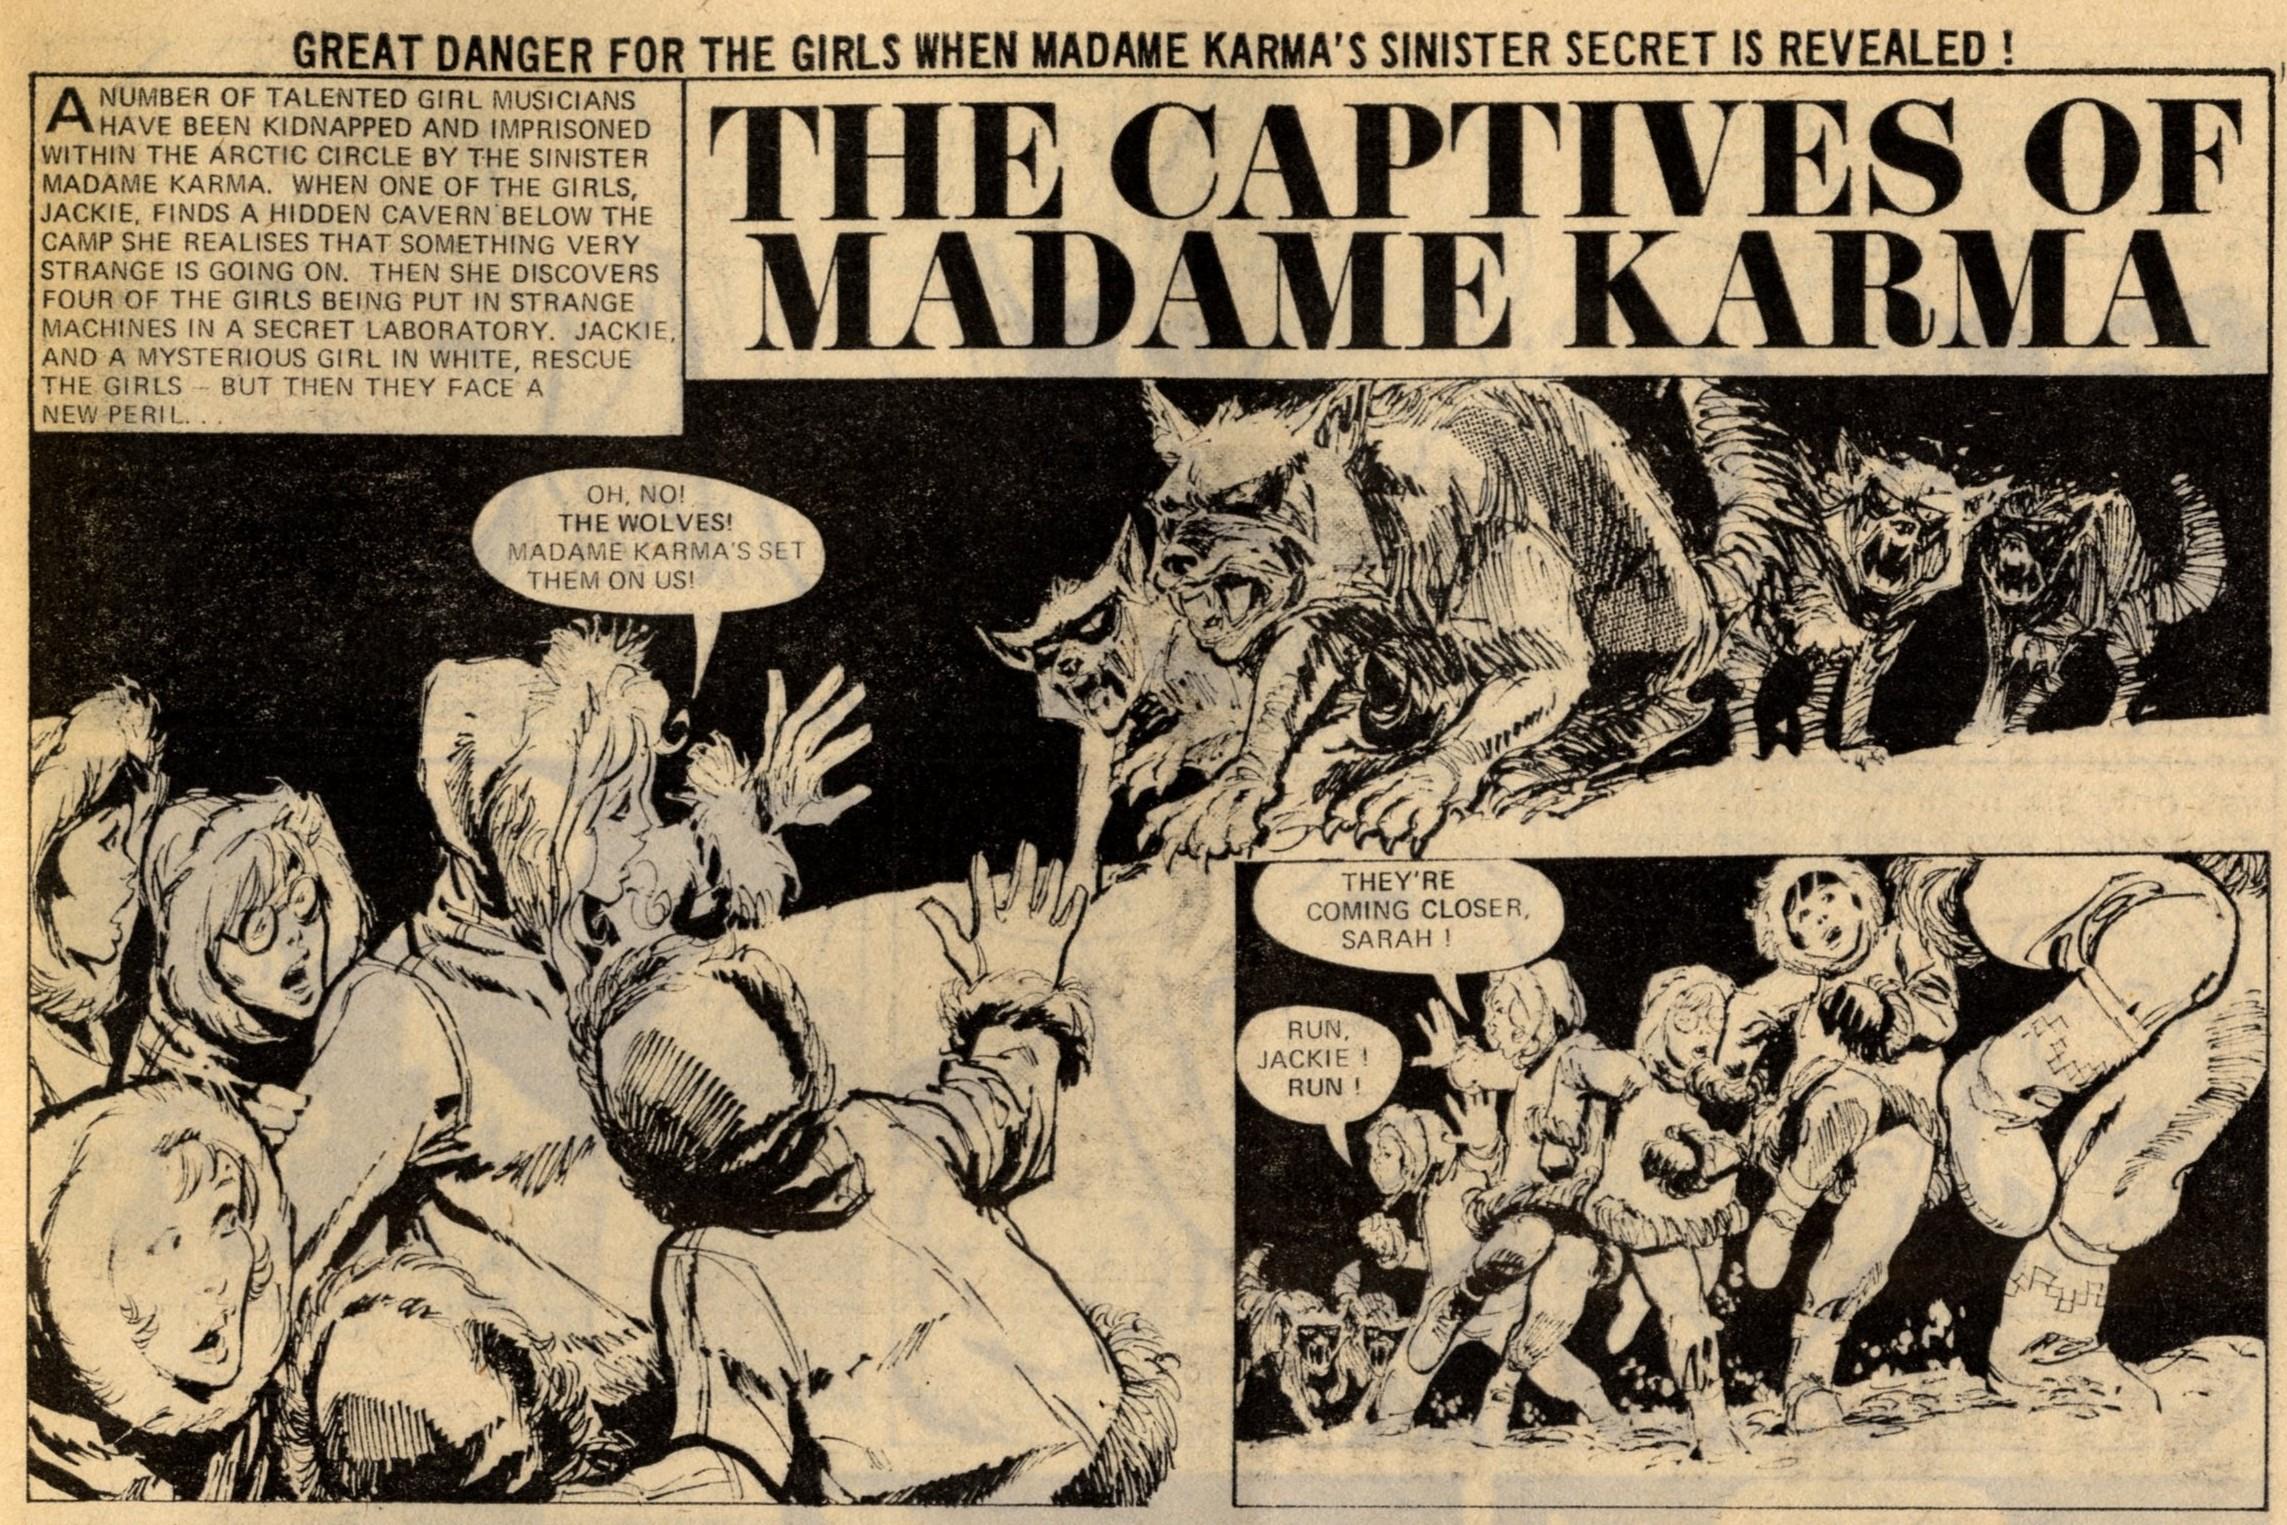 The Captives of Madame Karma: Homero Romeu (artist)